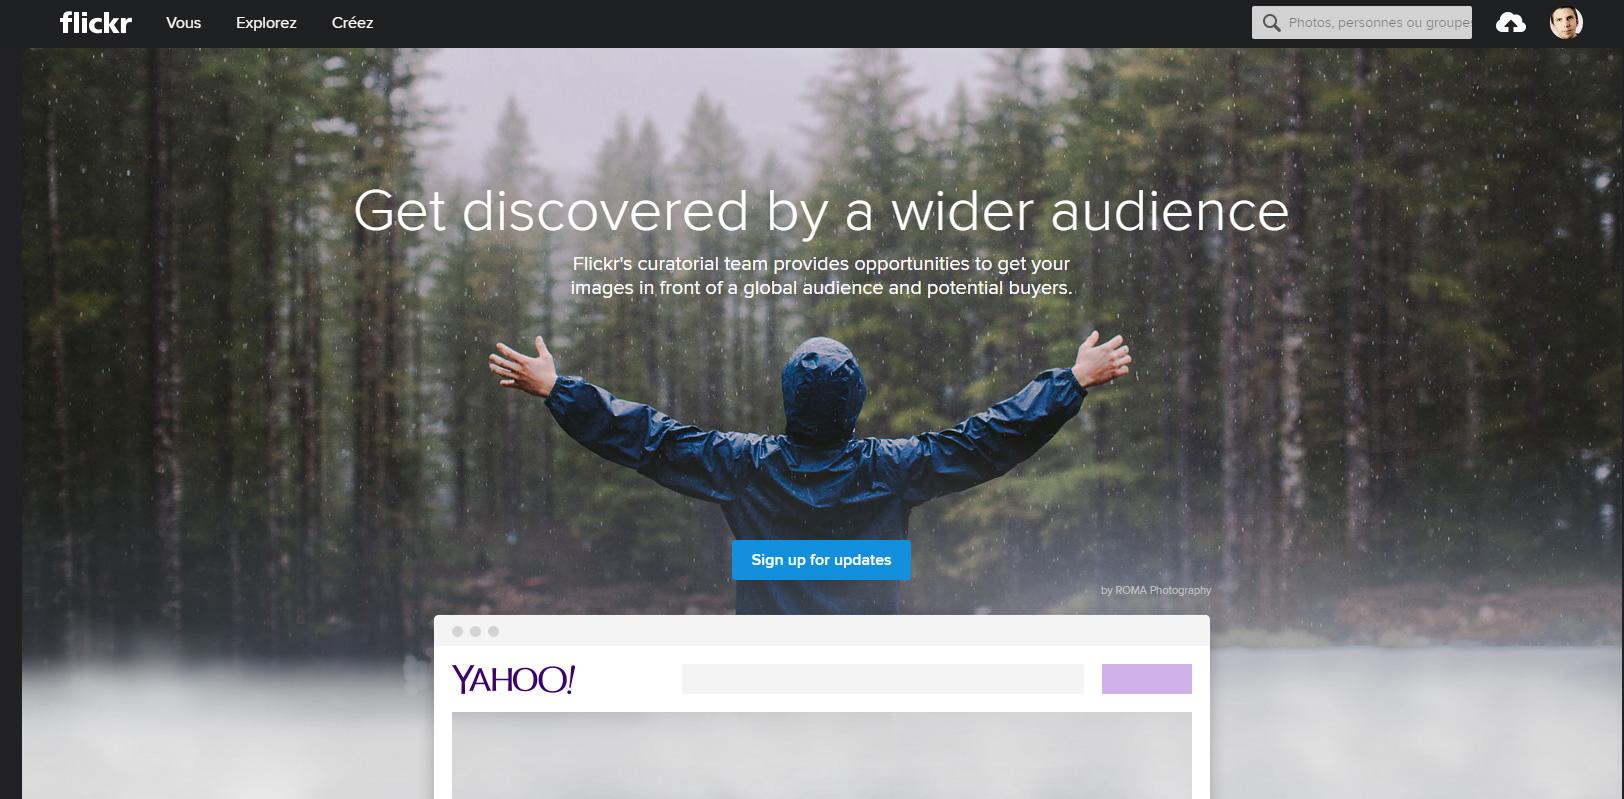 yahoo-flickr-marketplace